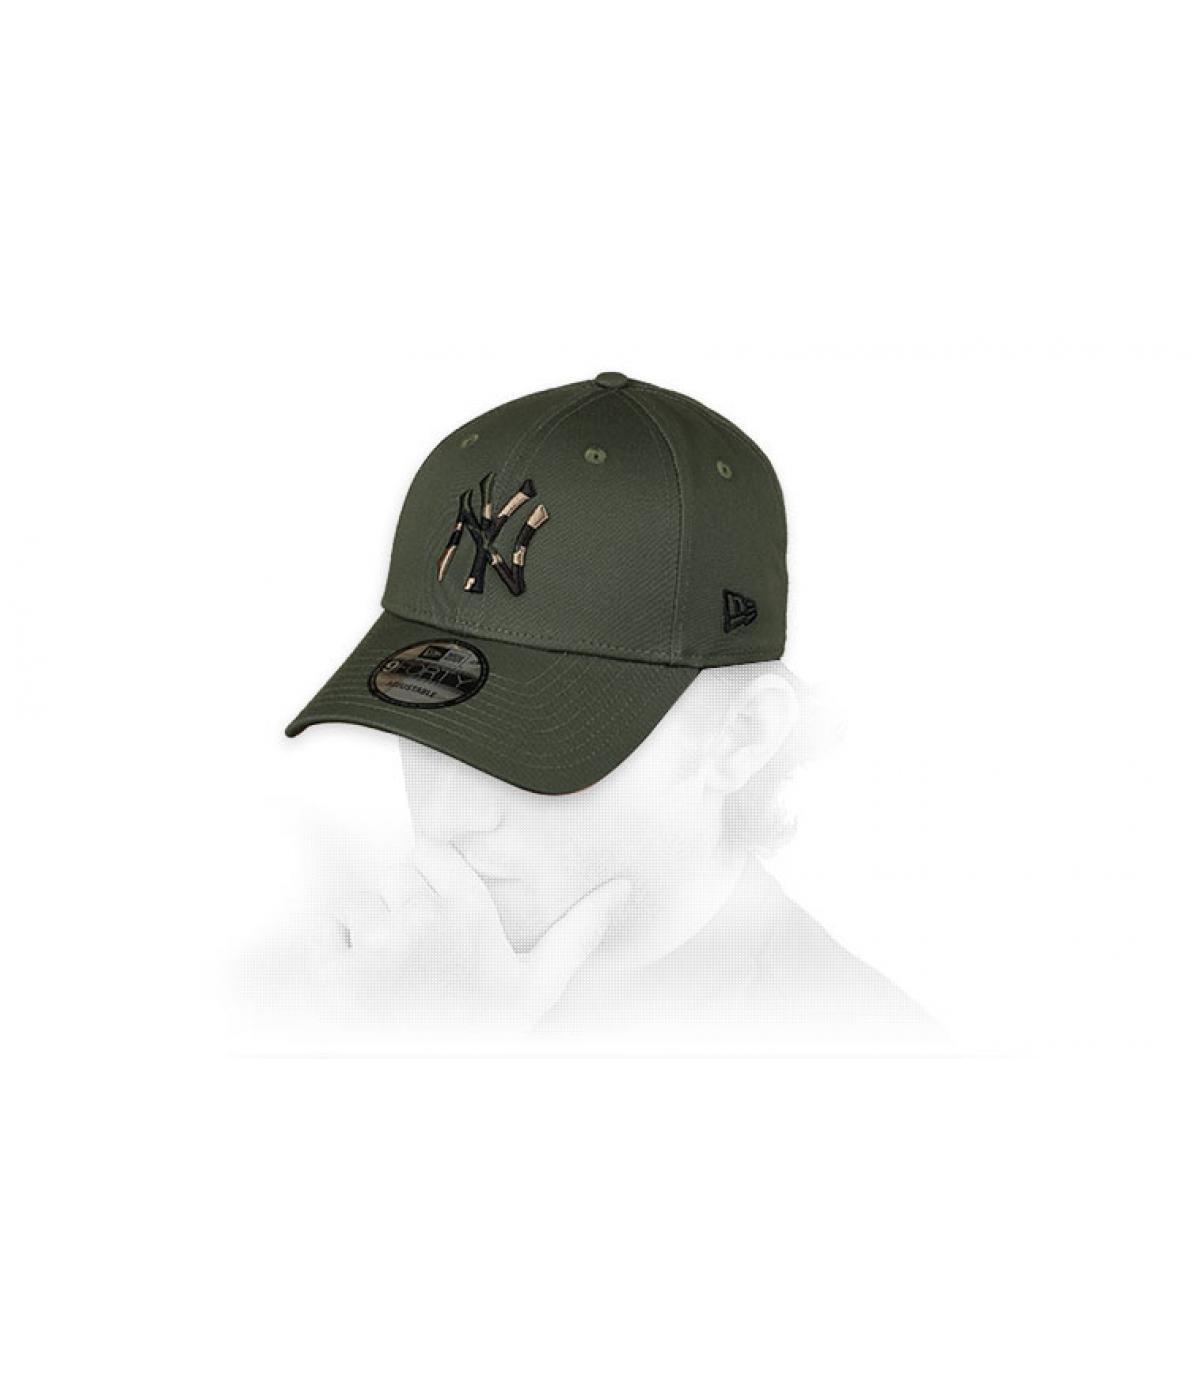 Cappellino NY verde mimetico